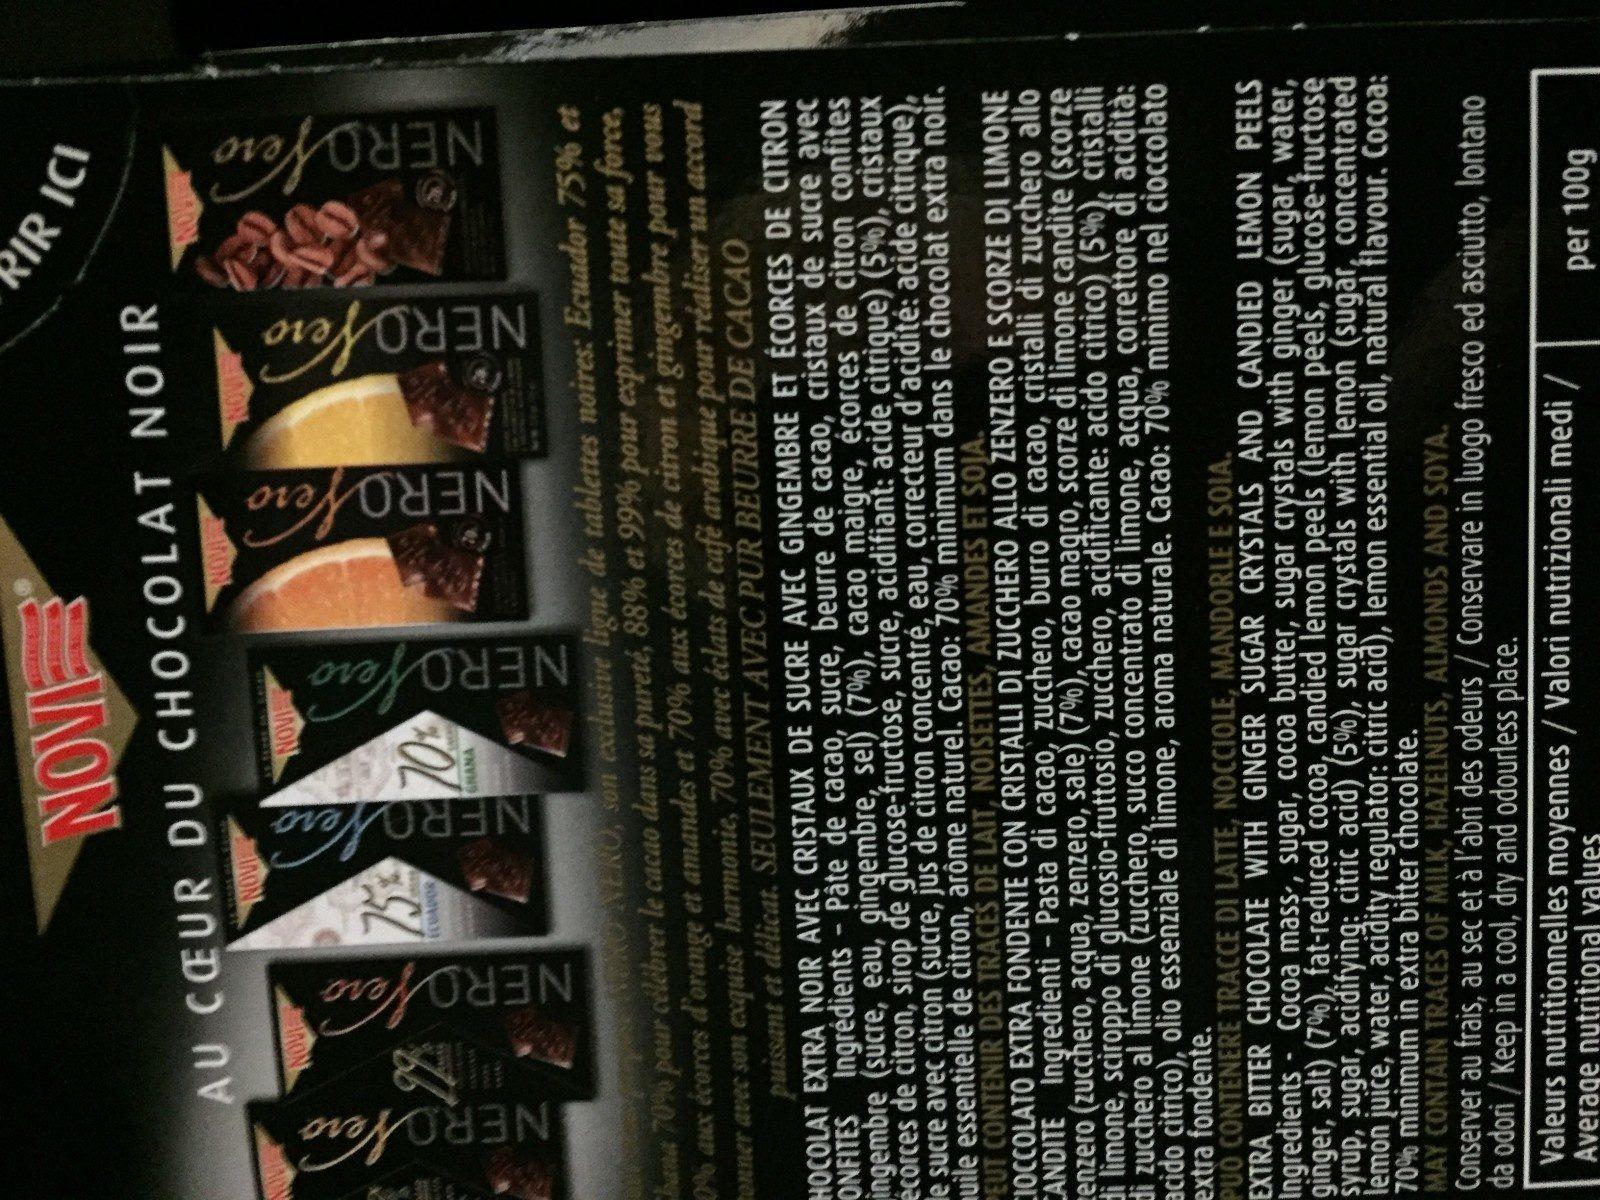 Nero Nero Extra Fondente con Scorzette di Limone - Ingrédients - fr